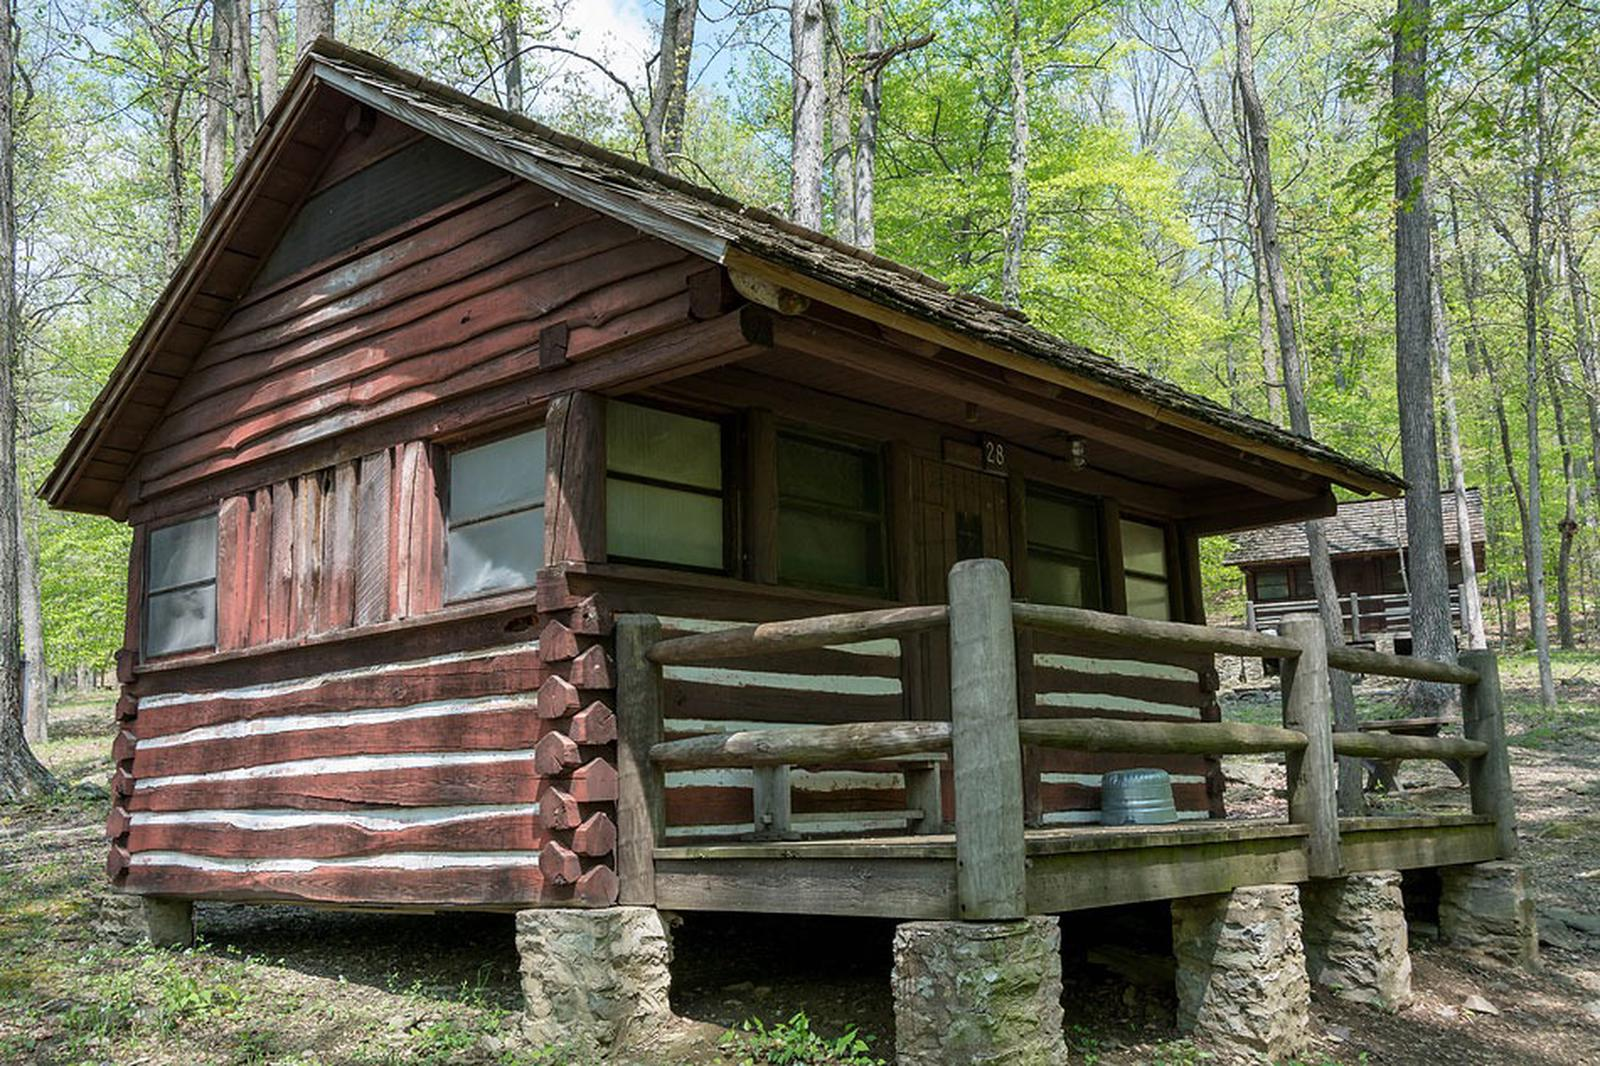 Camp Misty Mount Cabin 28